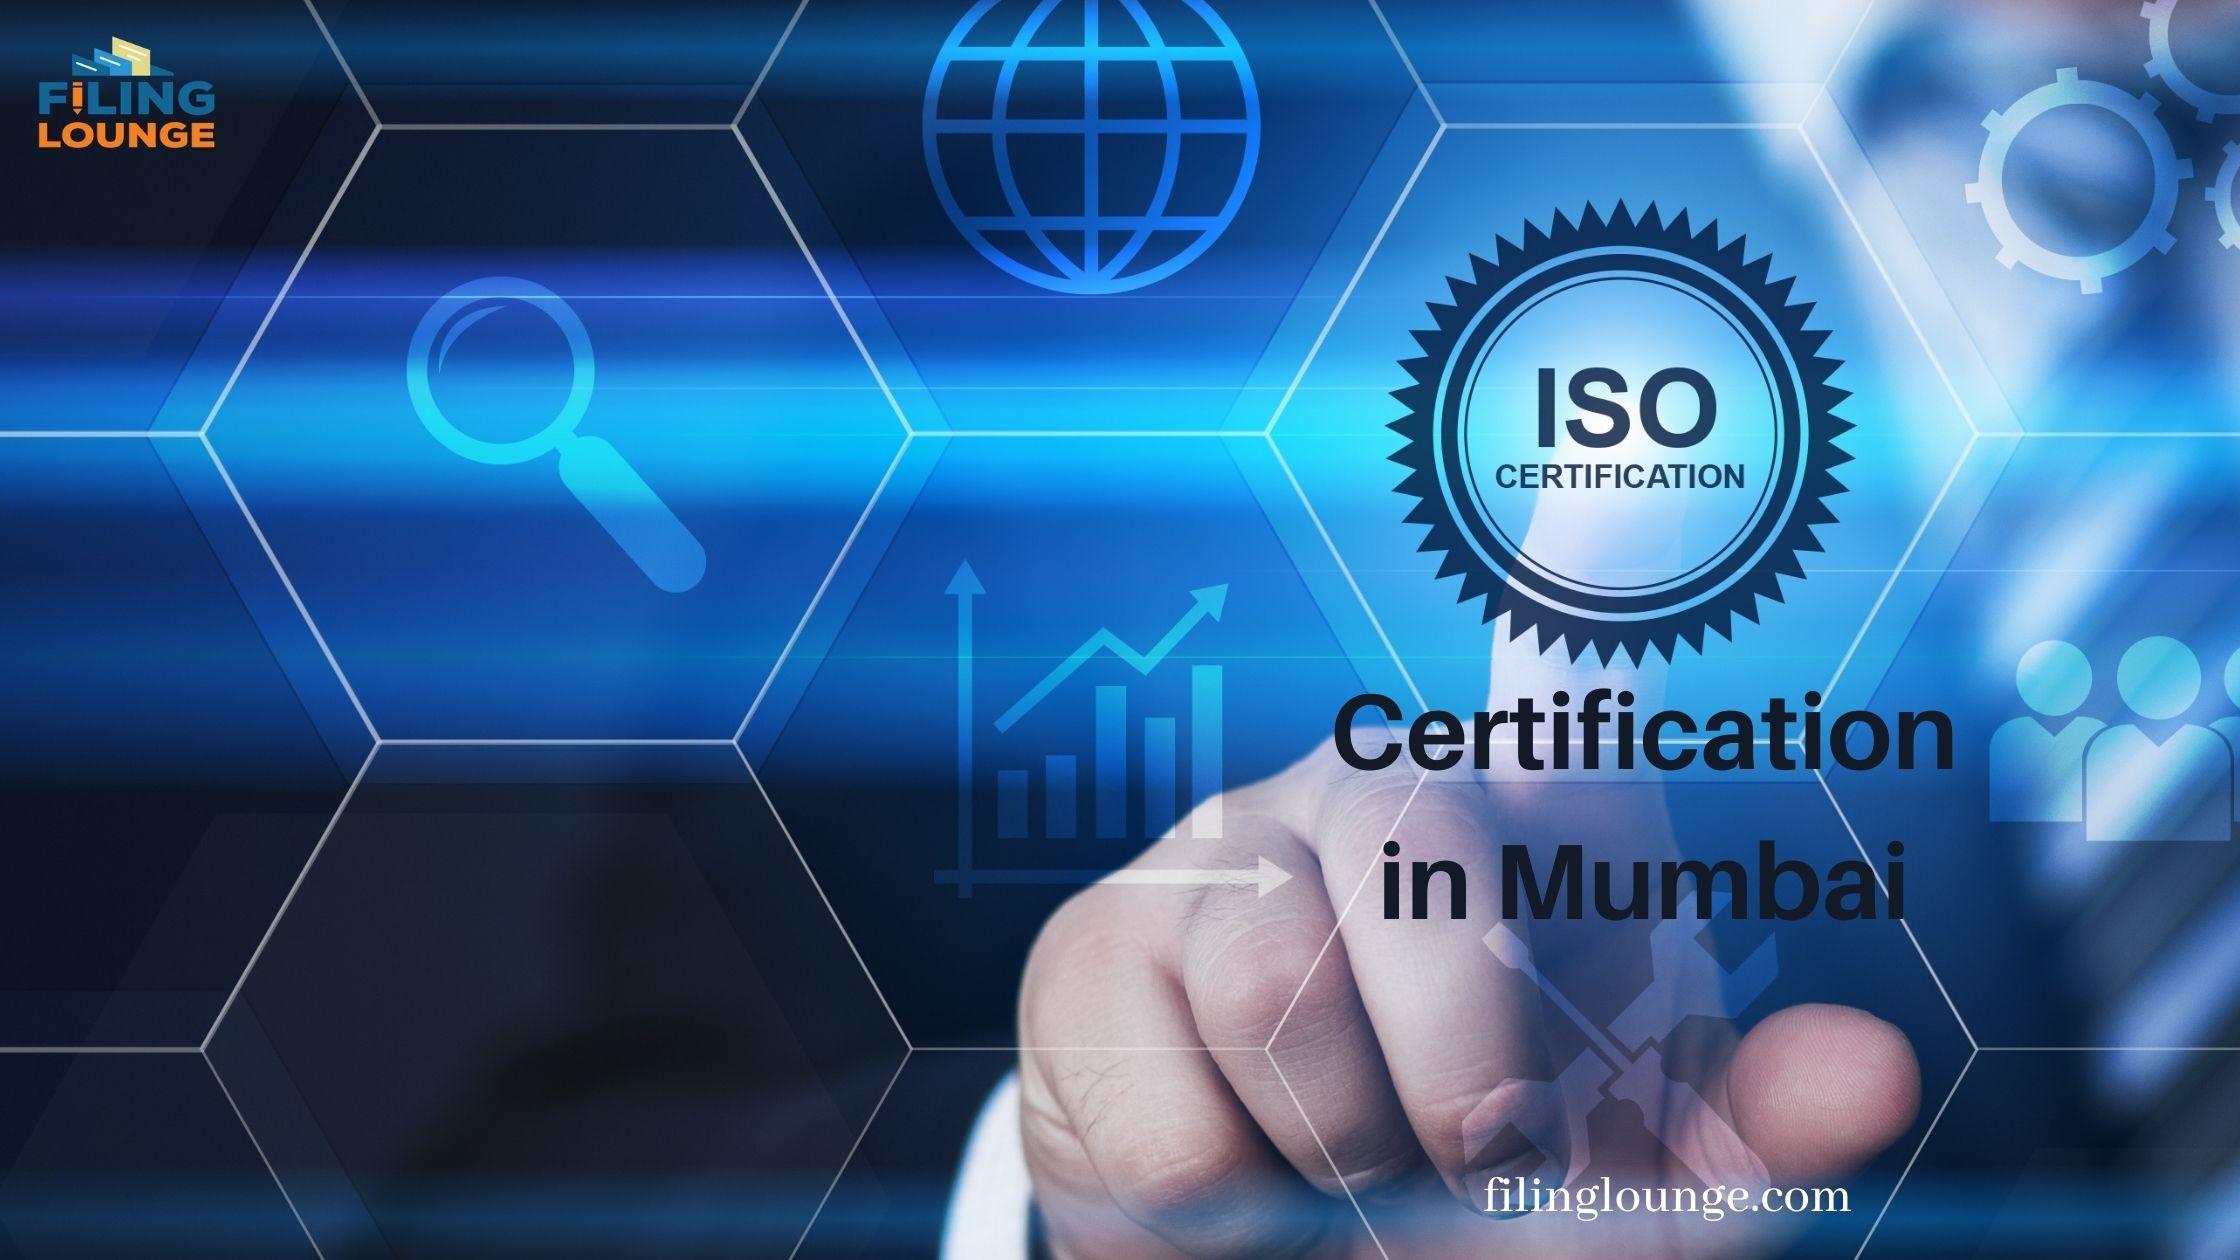 ISO 9001 certification in Mumbai